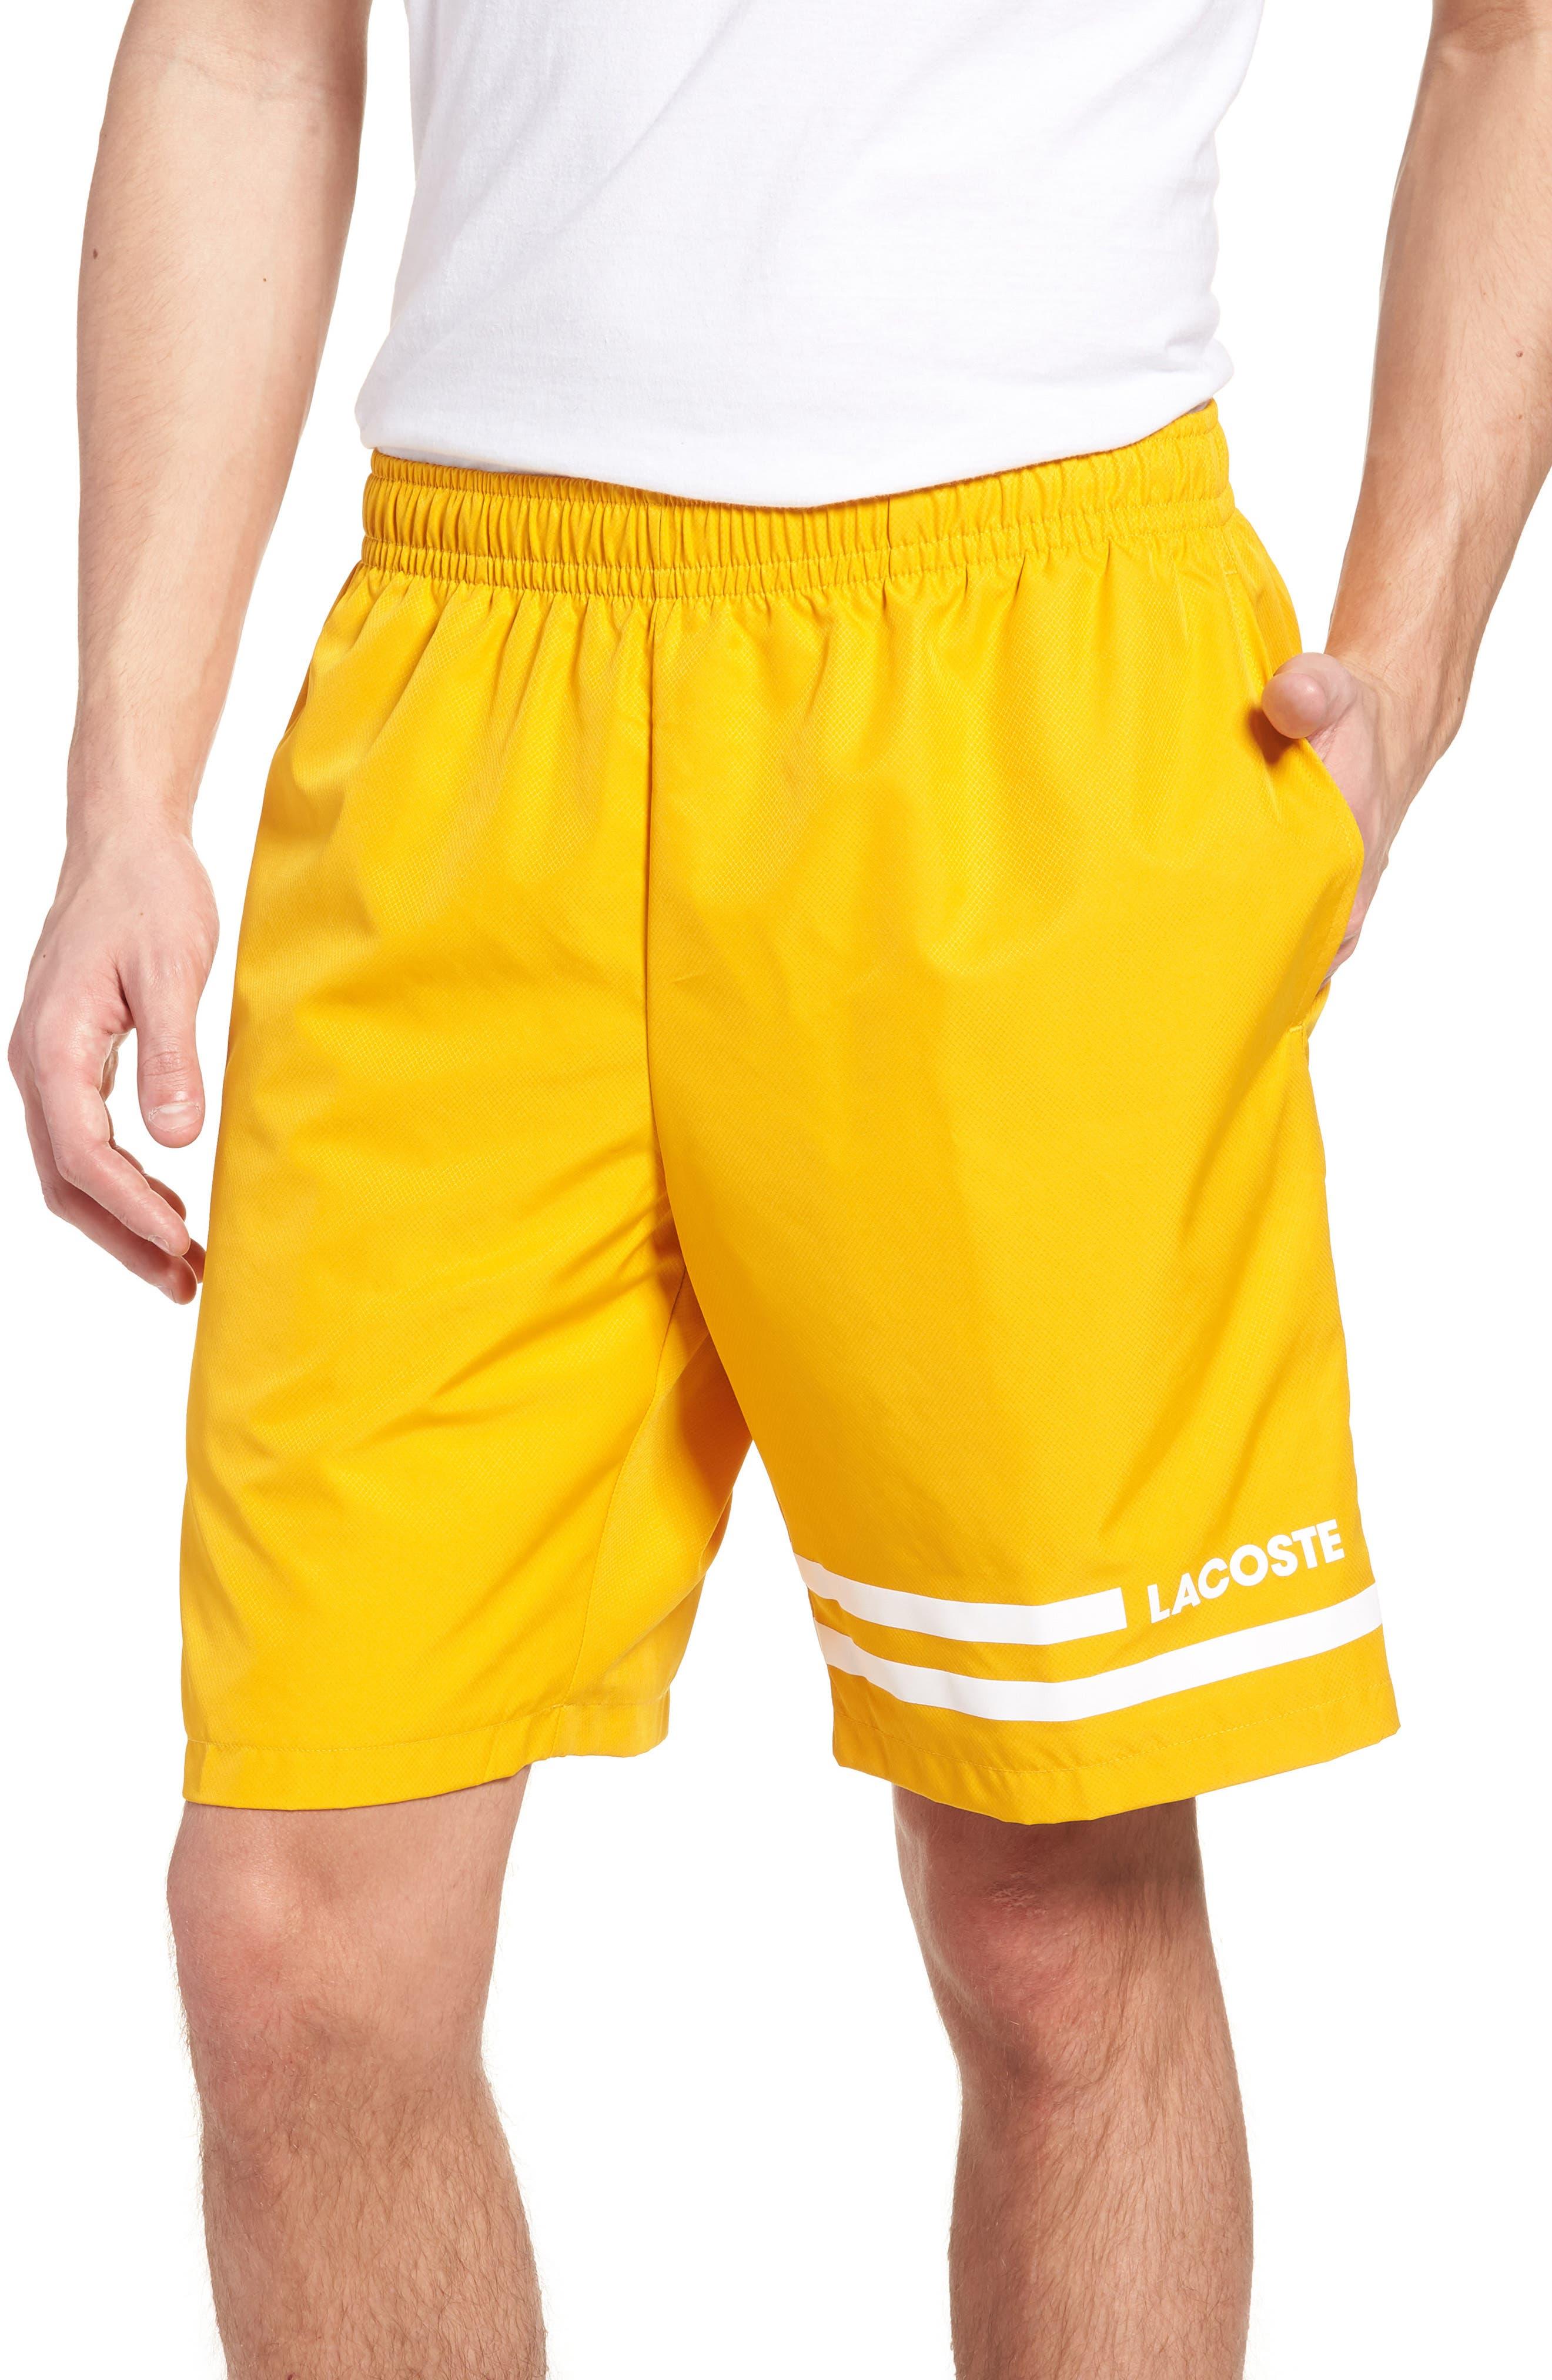 Stripe Shorts,                         Main,                         color, Buttercup/ White